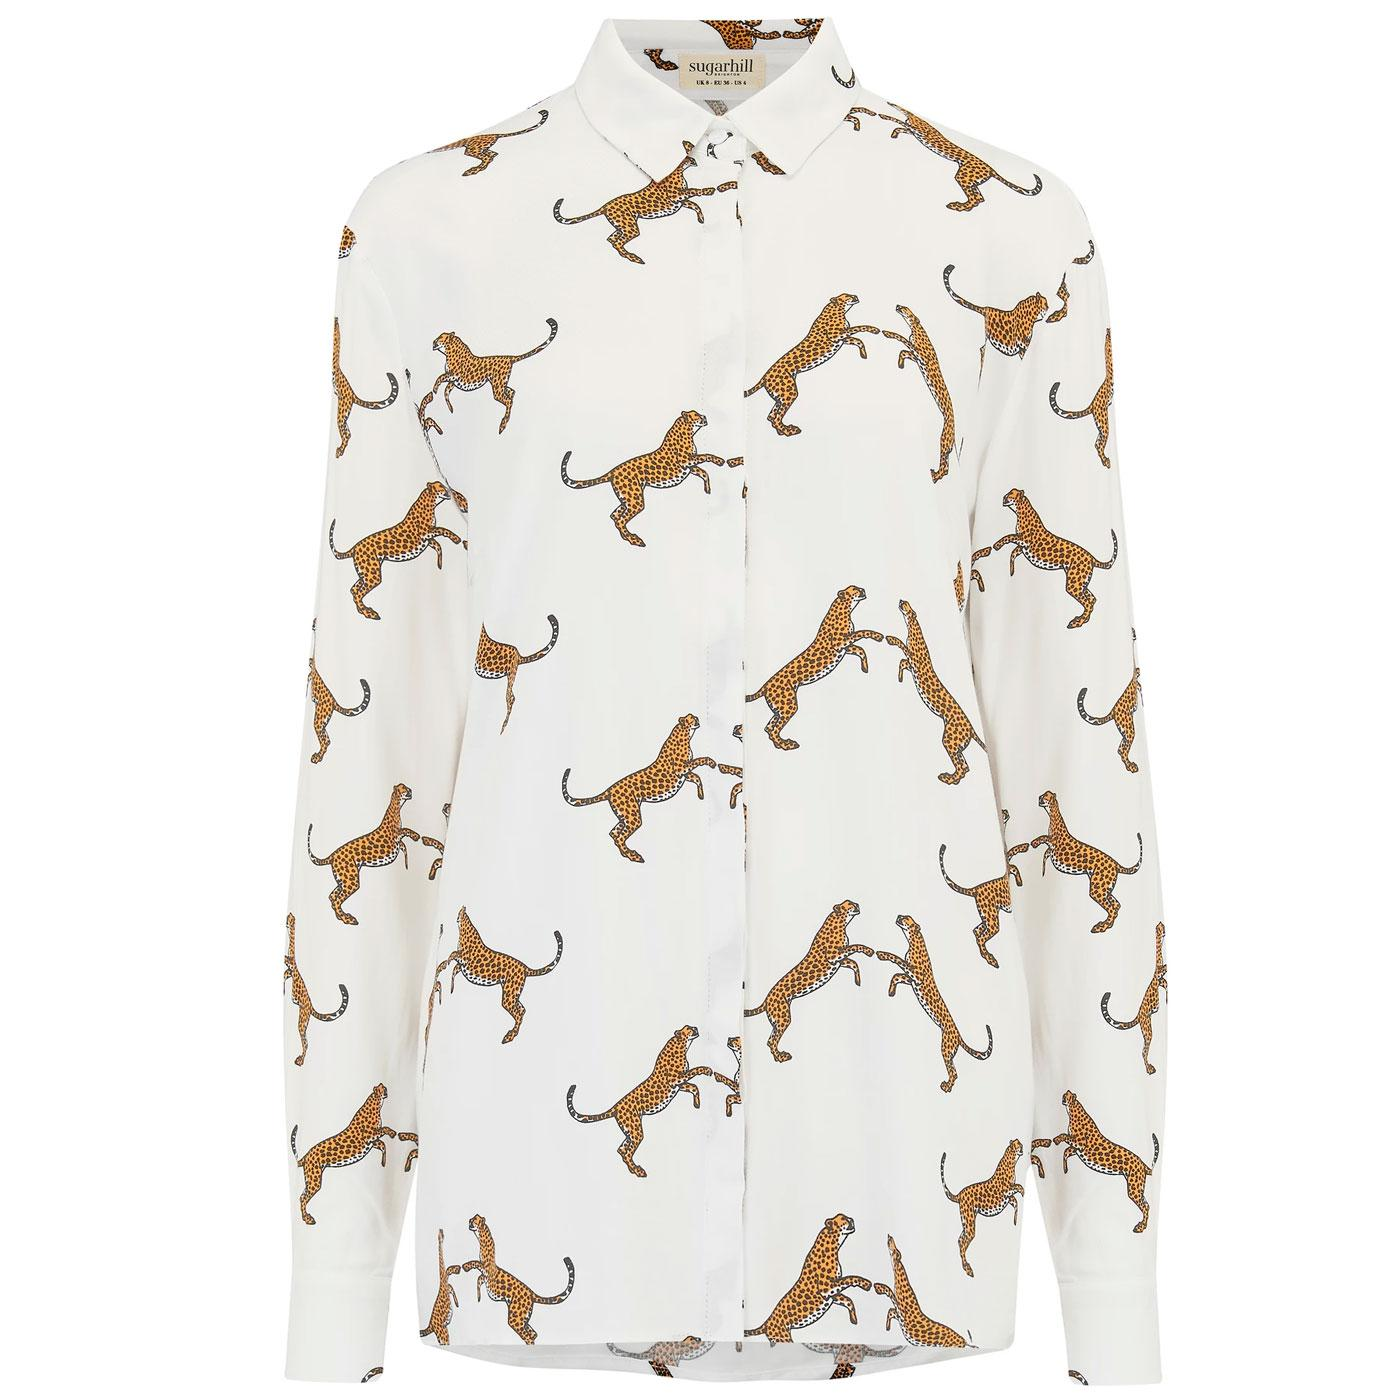 Joy SUGARHILL BRIGHTON Dancing Cheetahs Shirt